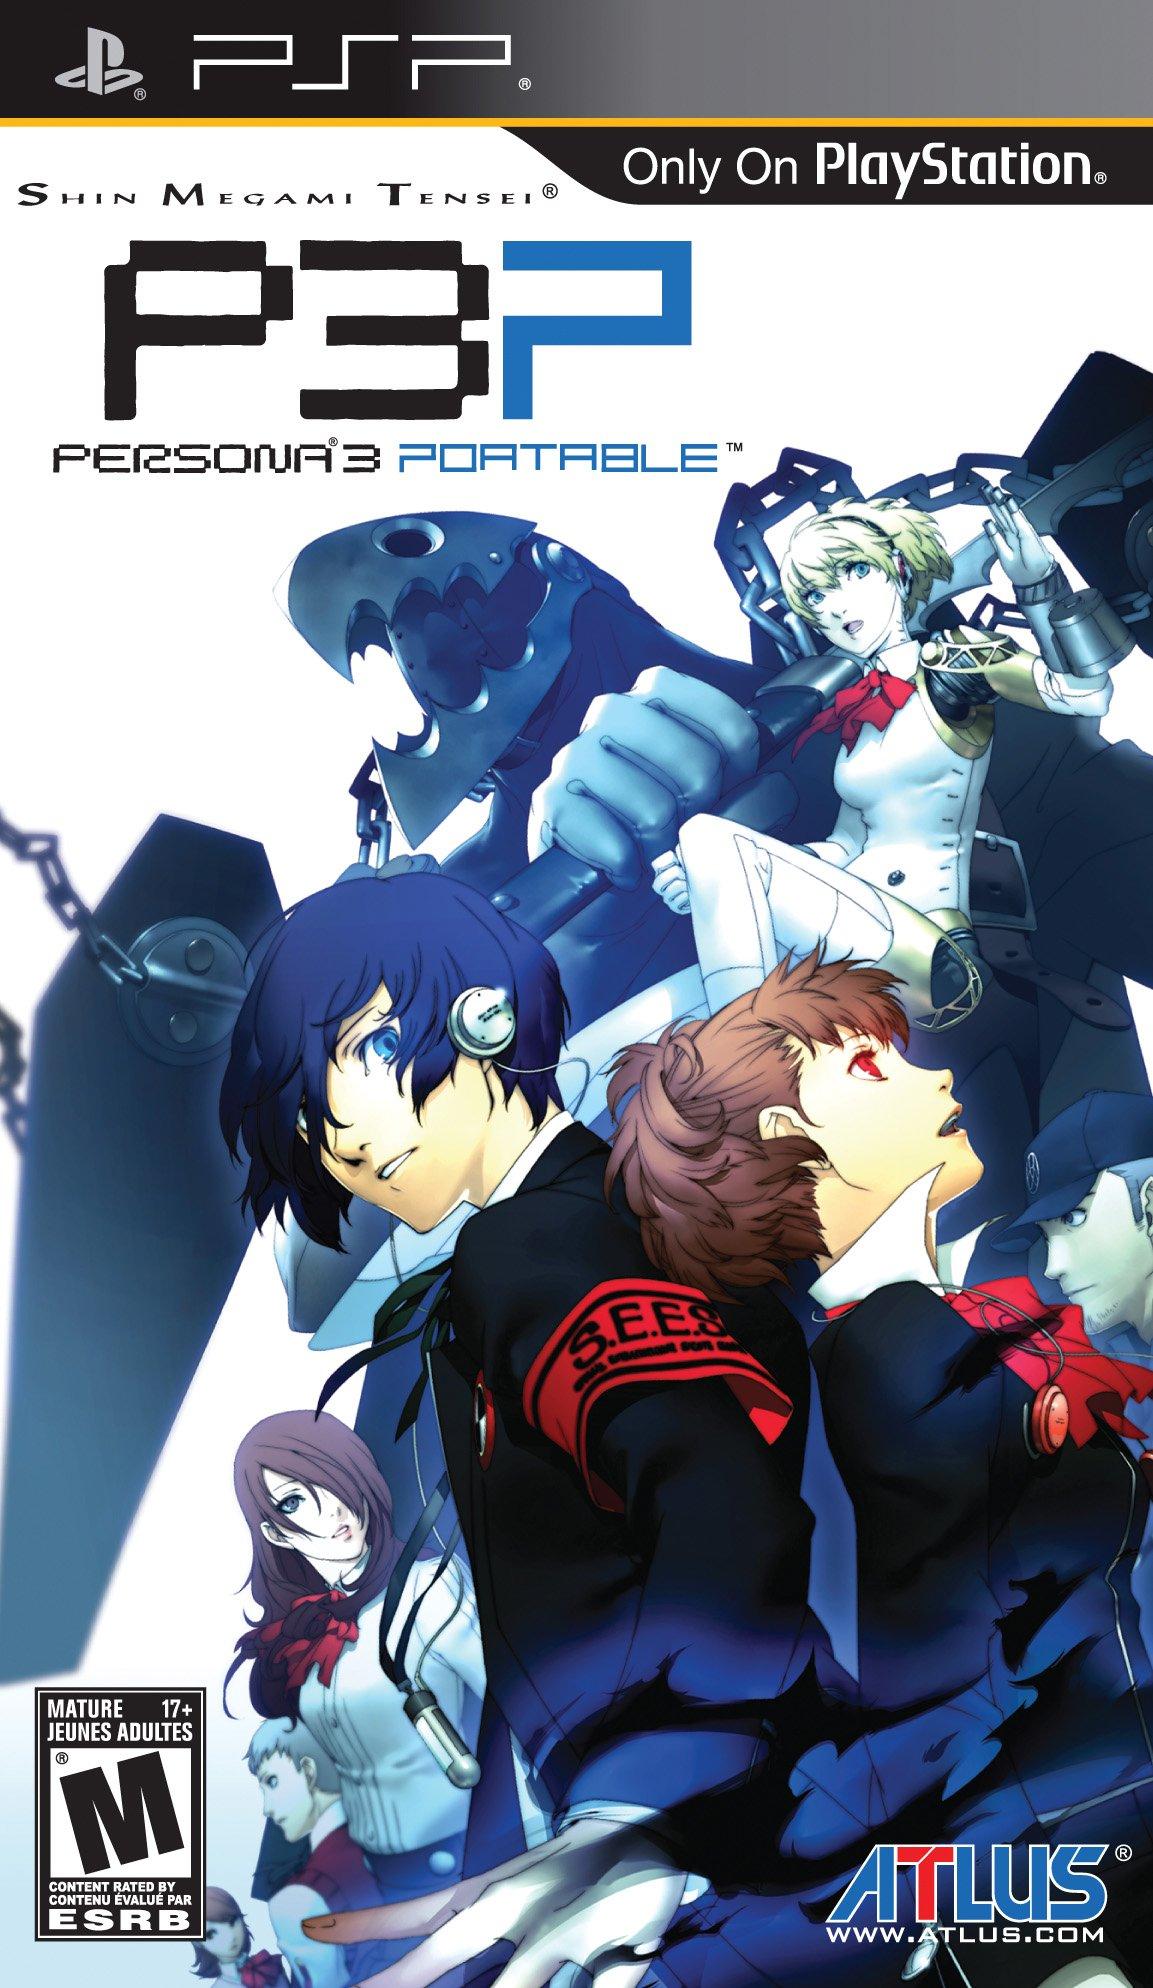 Shin Megami Tensei: Persona 3 Portable - Sony PSP by Atlus (Image #1)